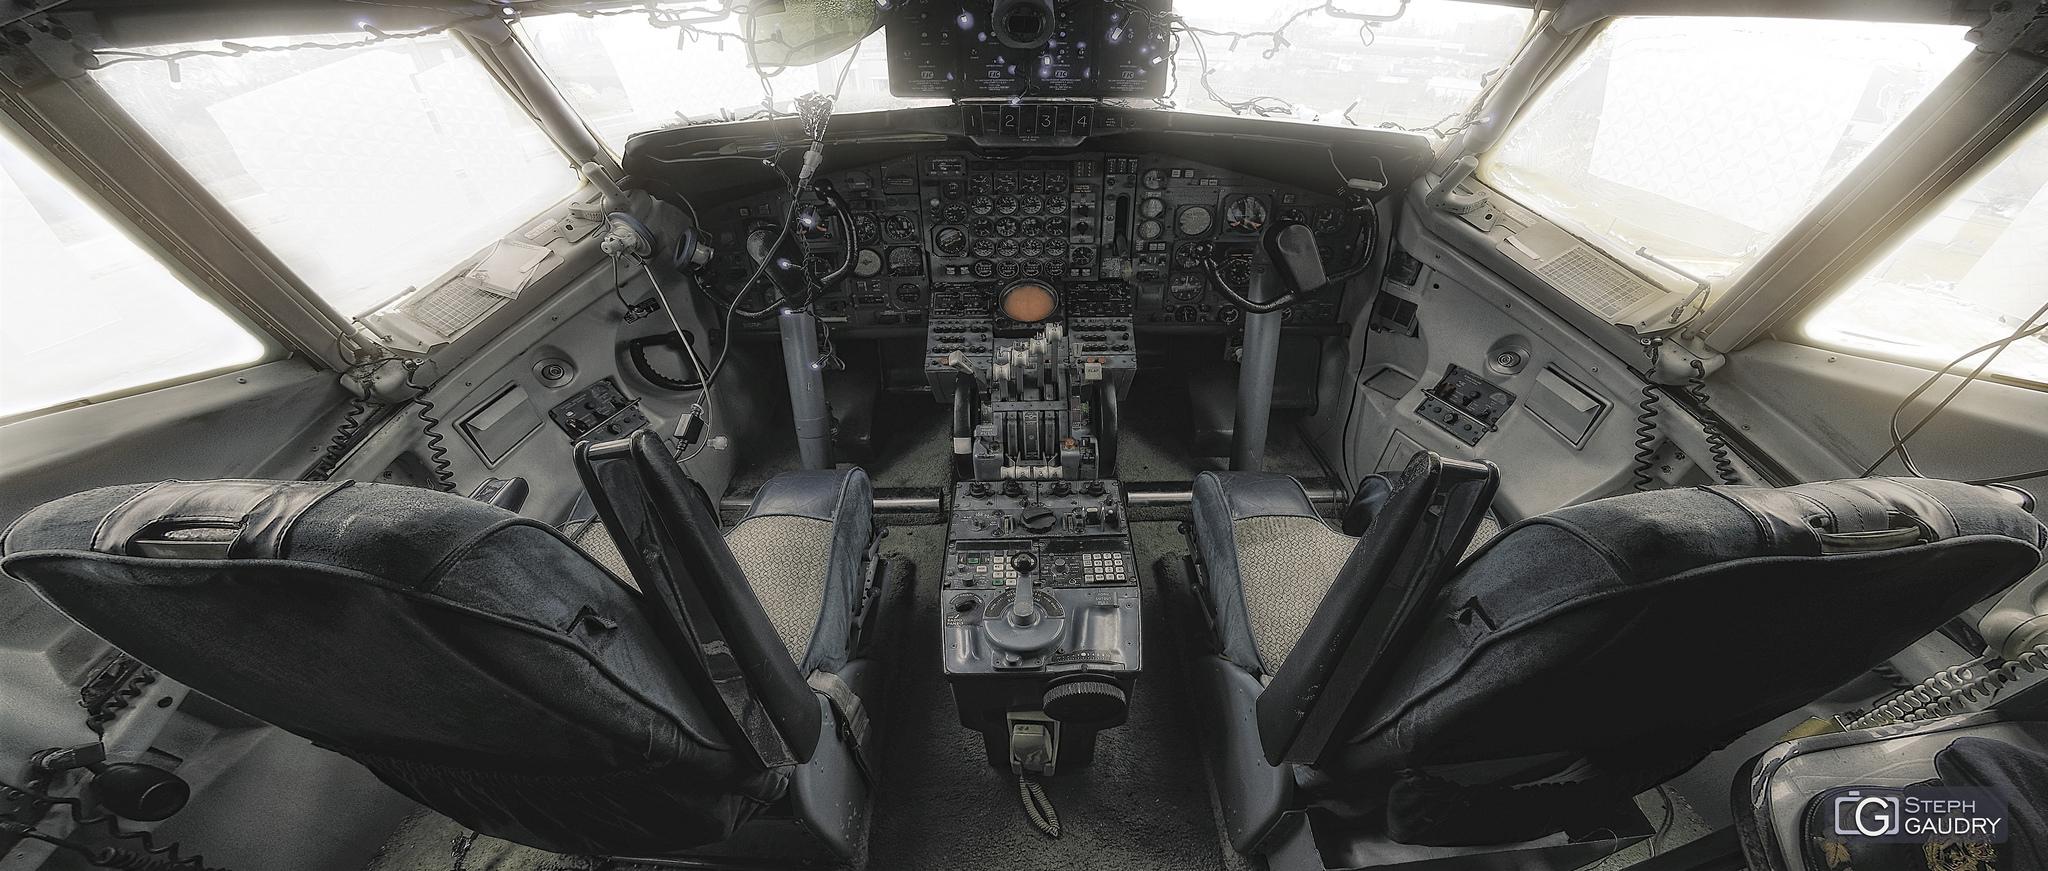 Cockpit Boeing 707 - Flat colored version